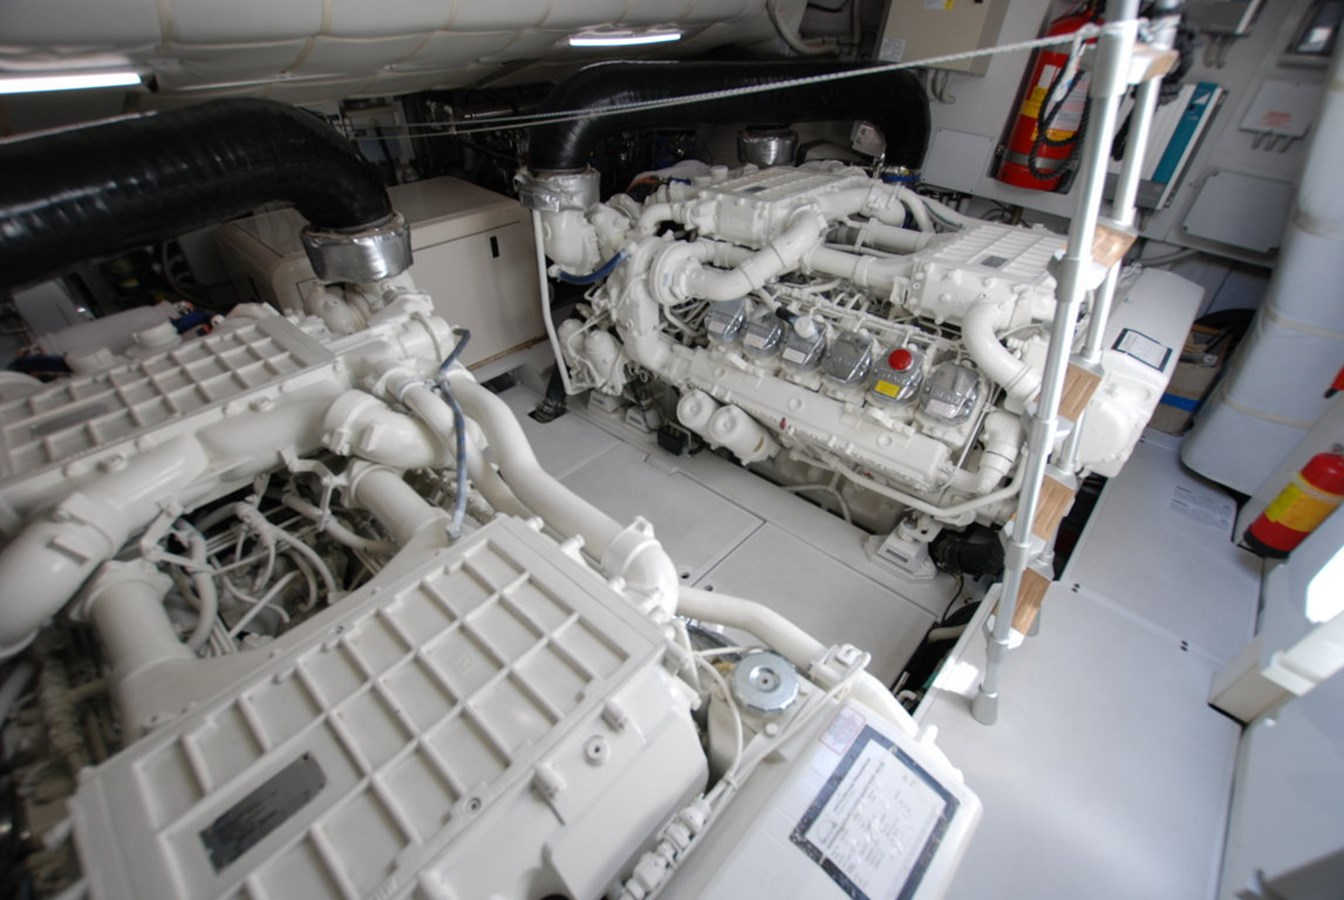 DSC_3950 (FILEminimizer) 2007 PERSHING 62 HT Motor Yacht 2756215